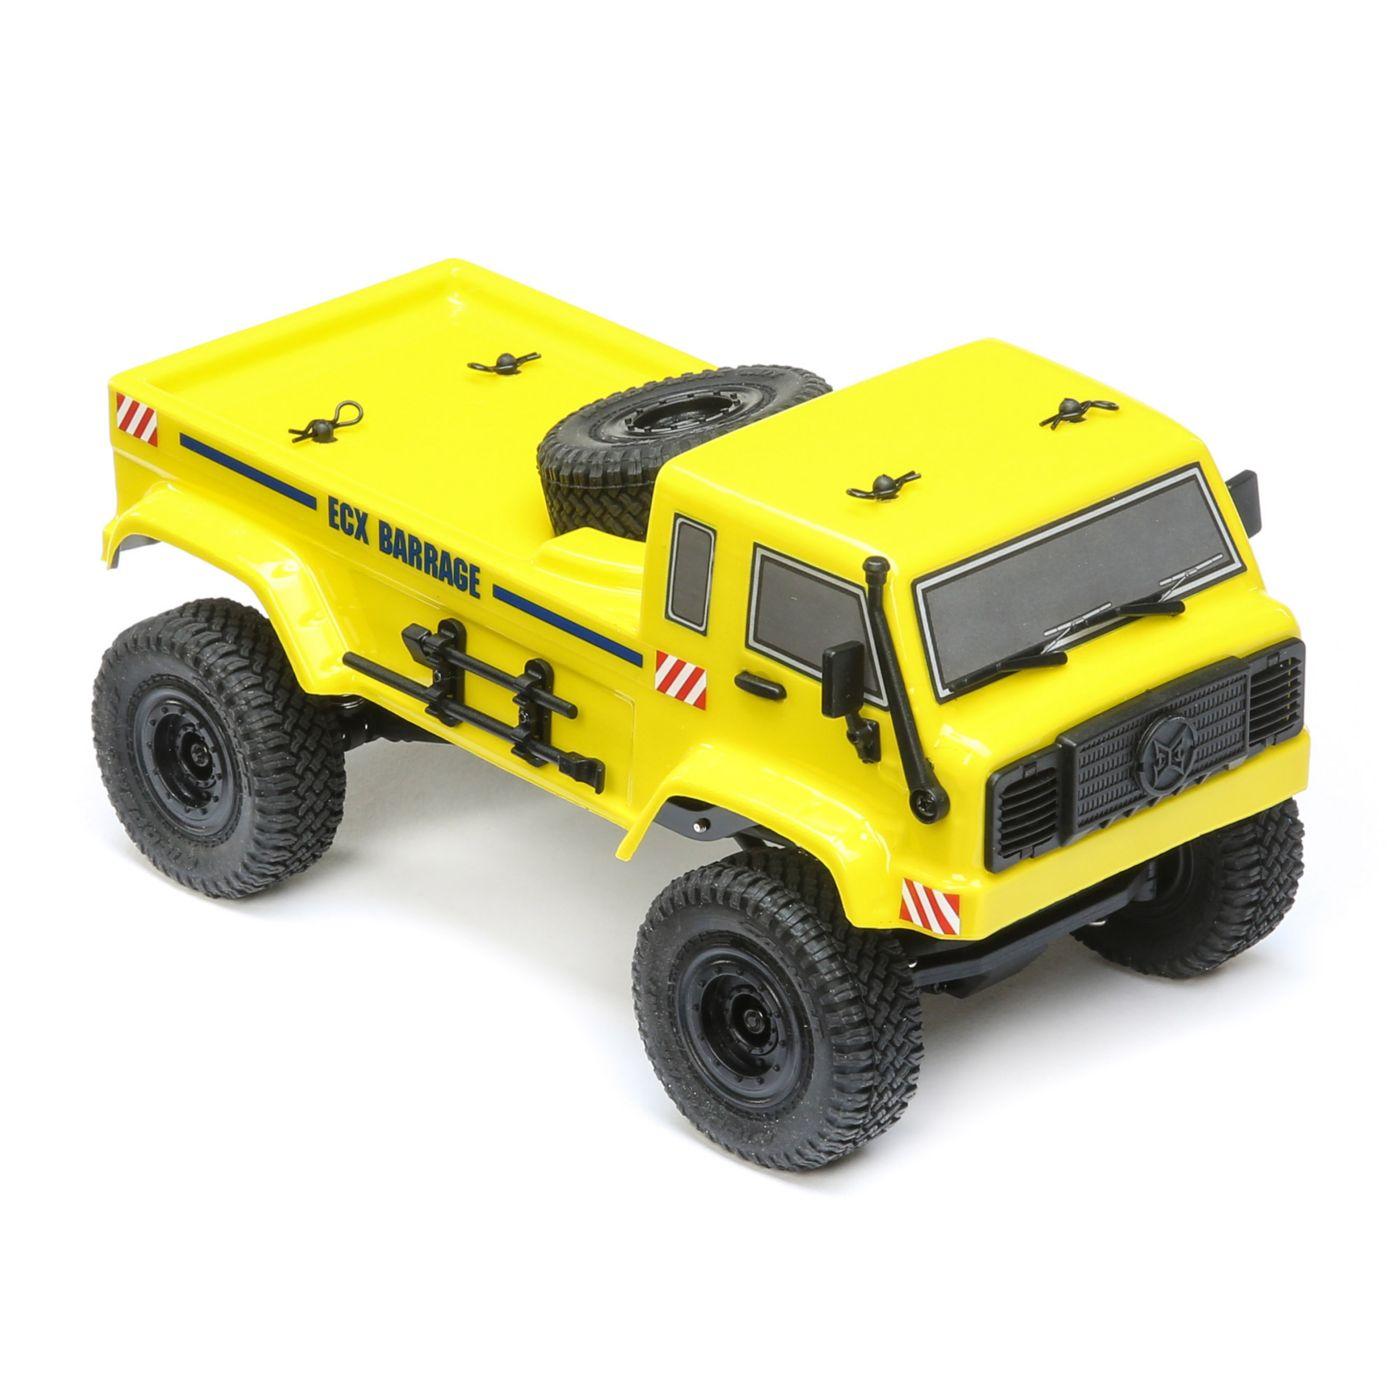 ECX Barrage 1/24 UV Scaler Crawler